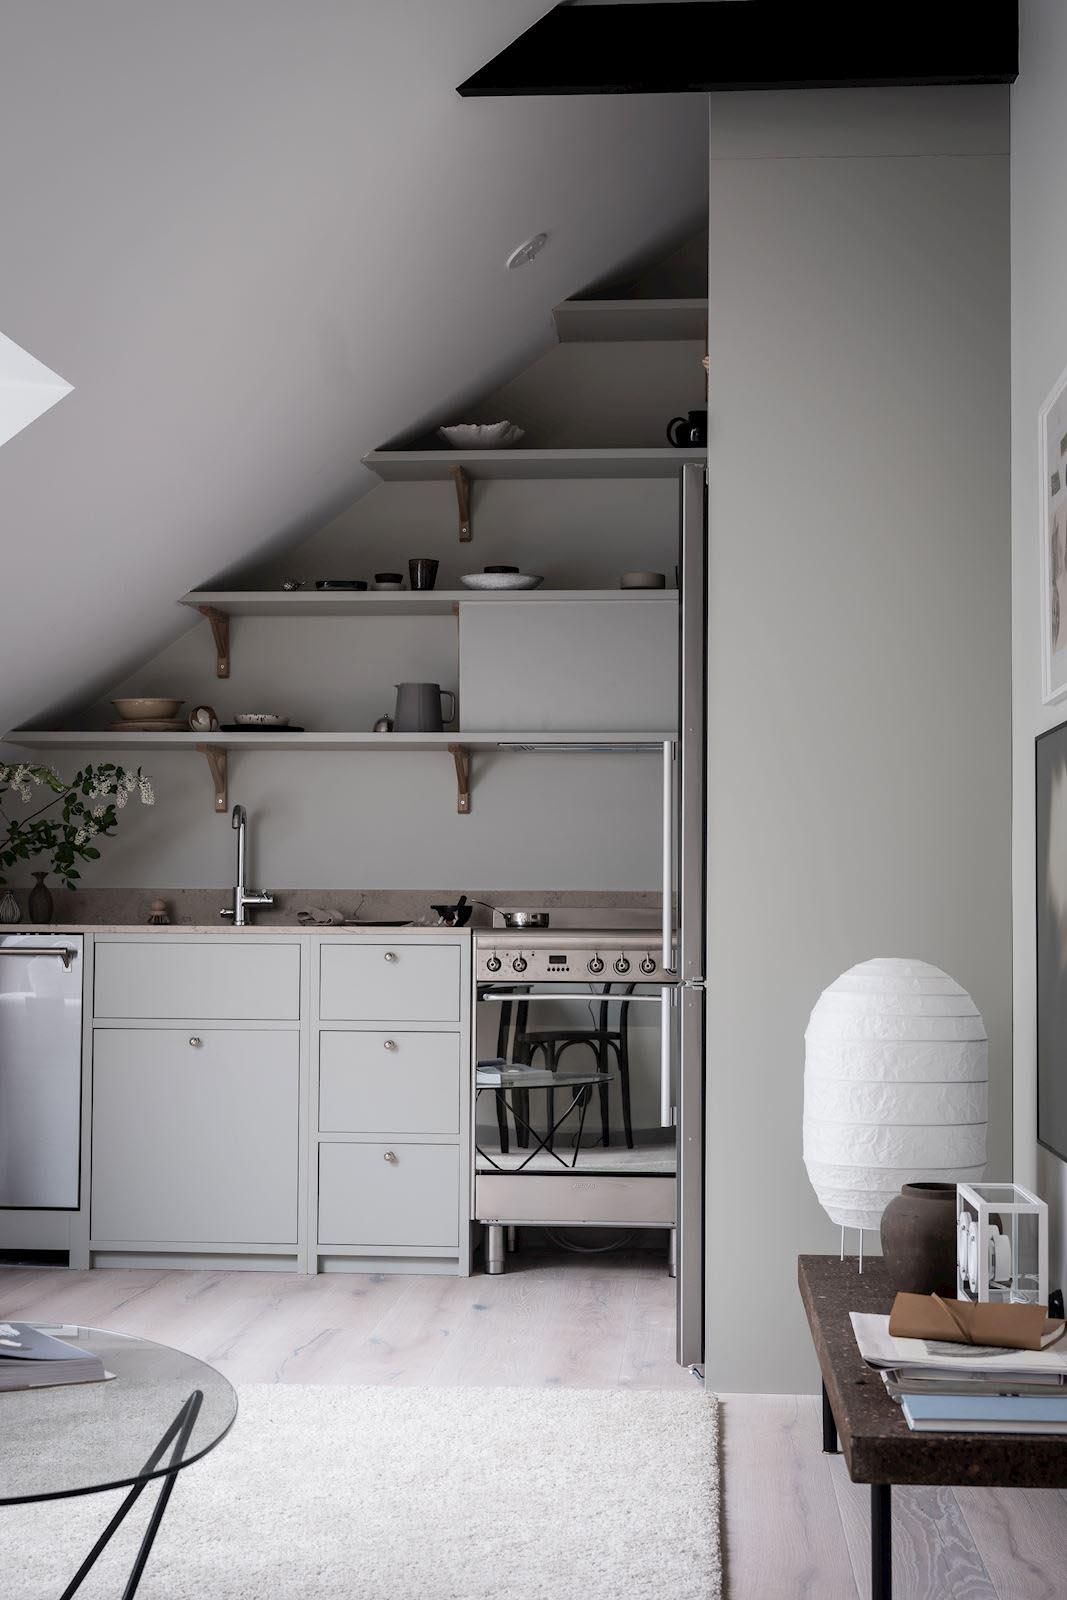 Small Kitchen Design Inspiration The Home Studio Interior Designers